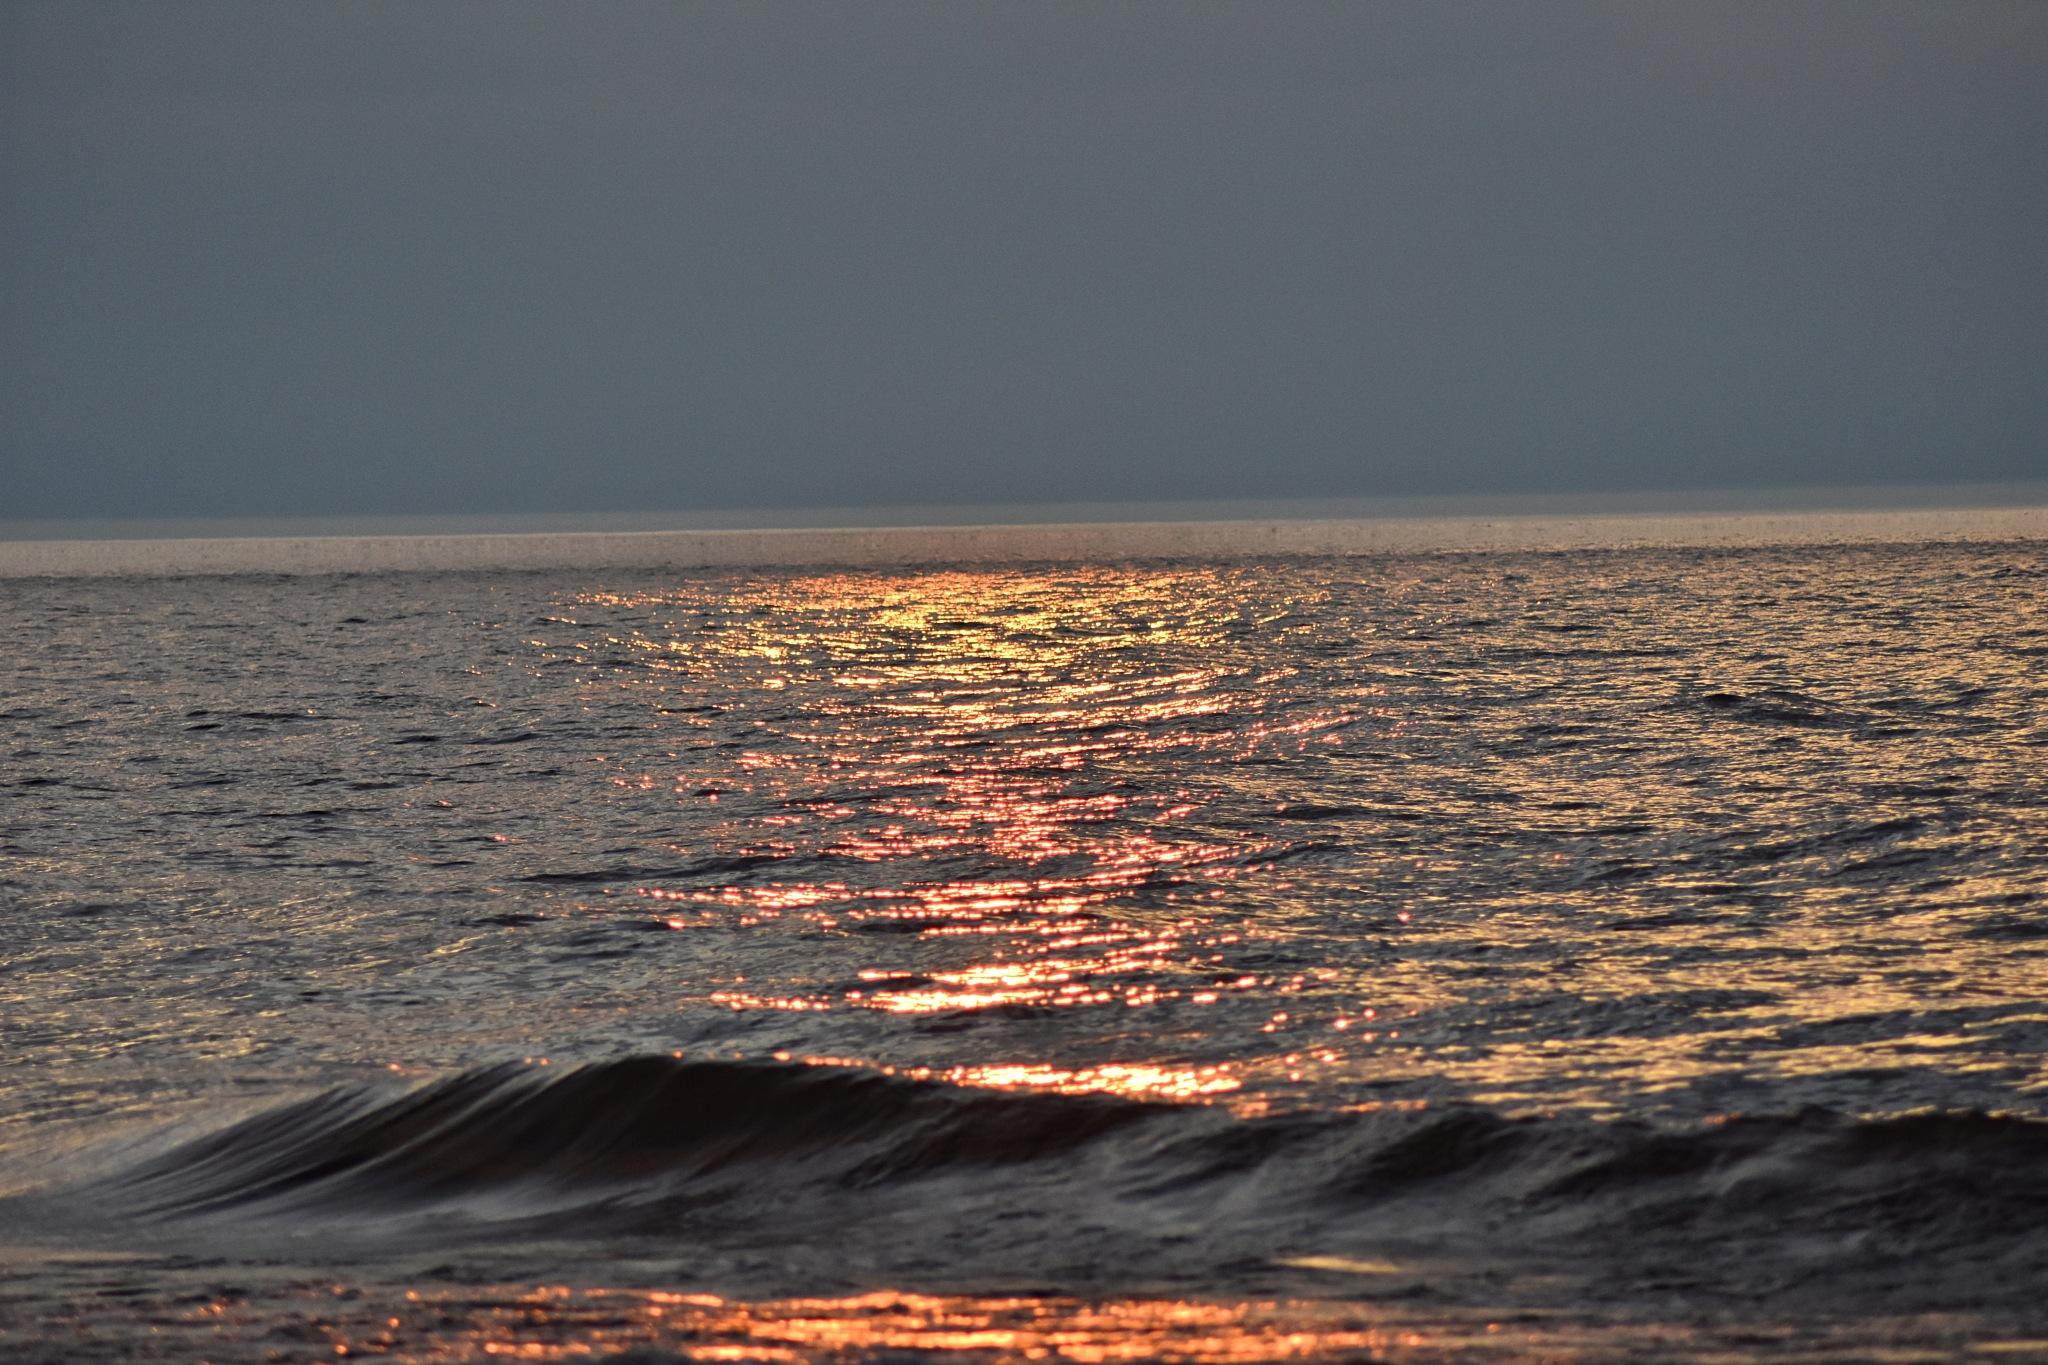 Daylight's Kiss Goodnight by Gena Koelker